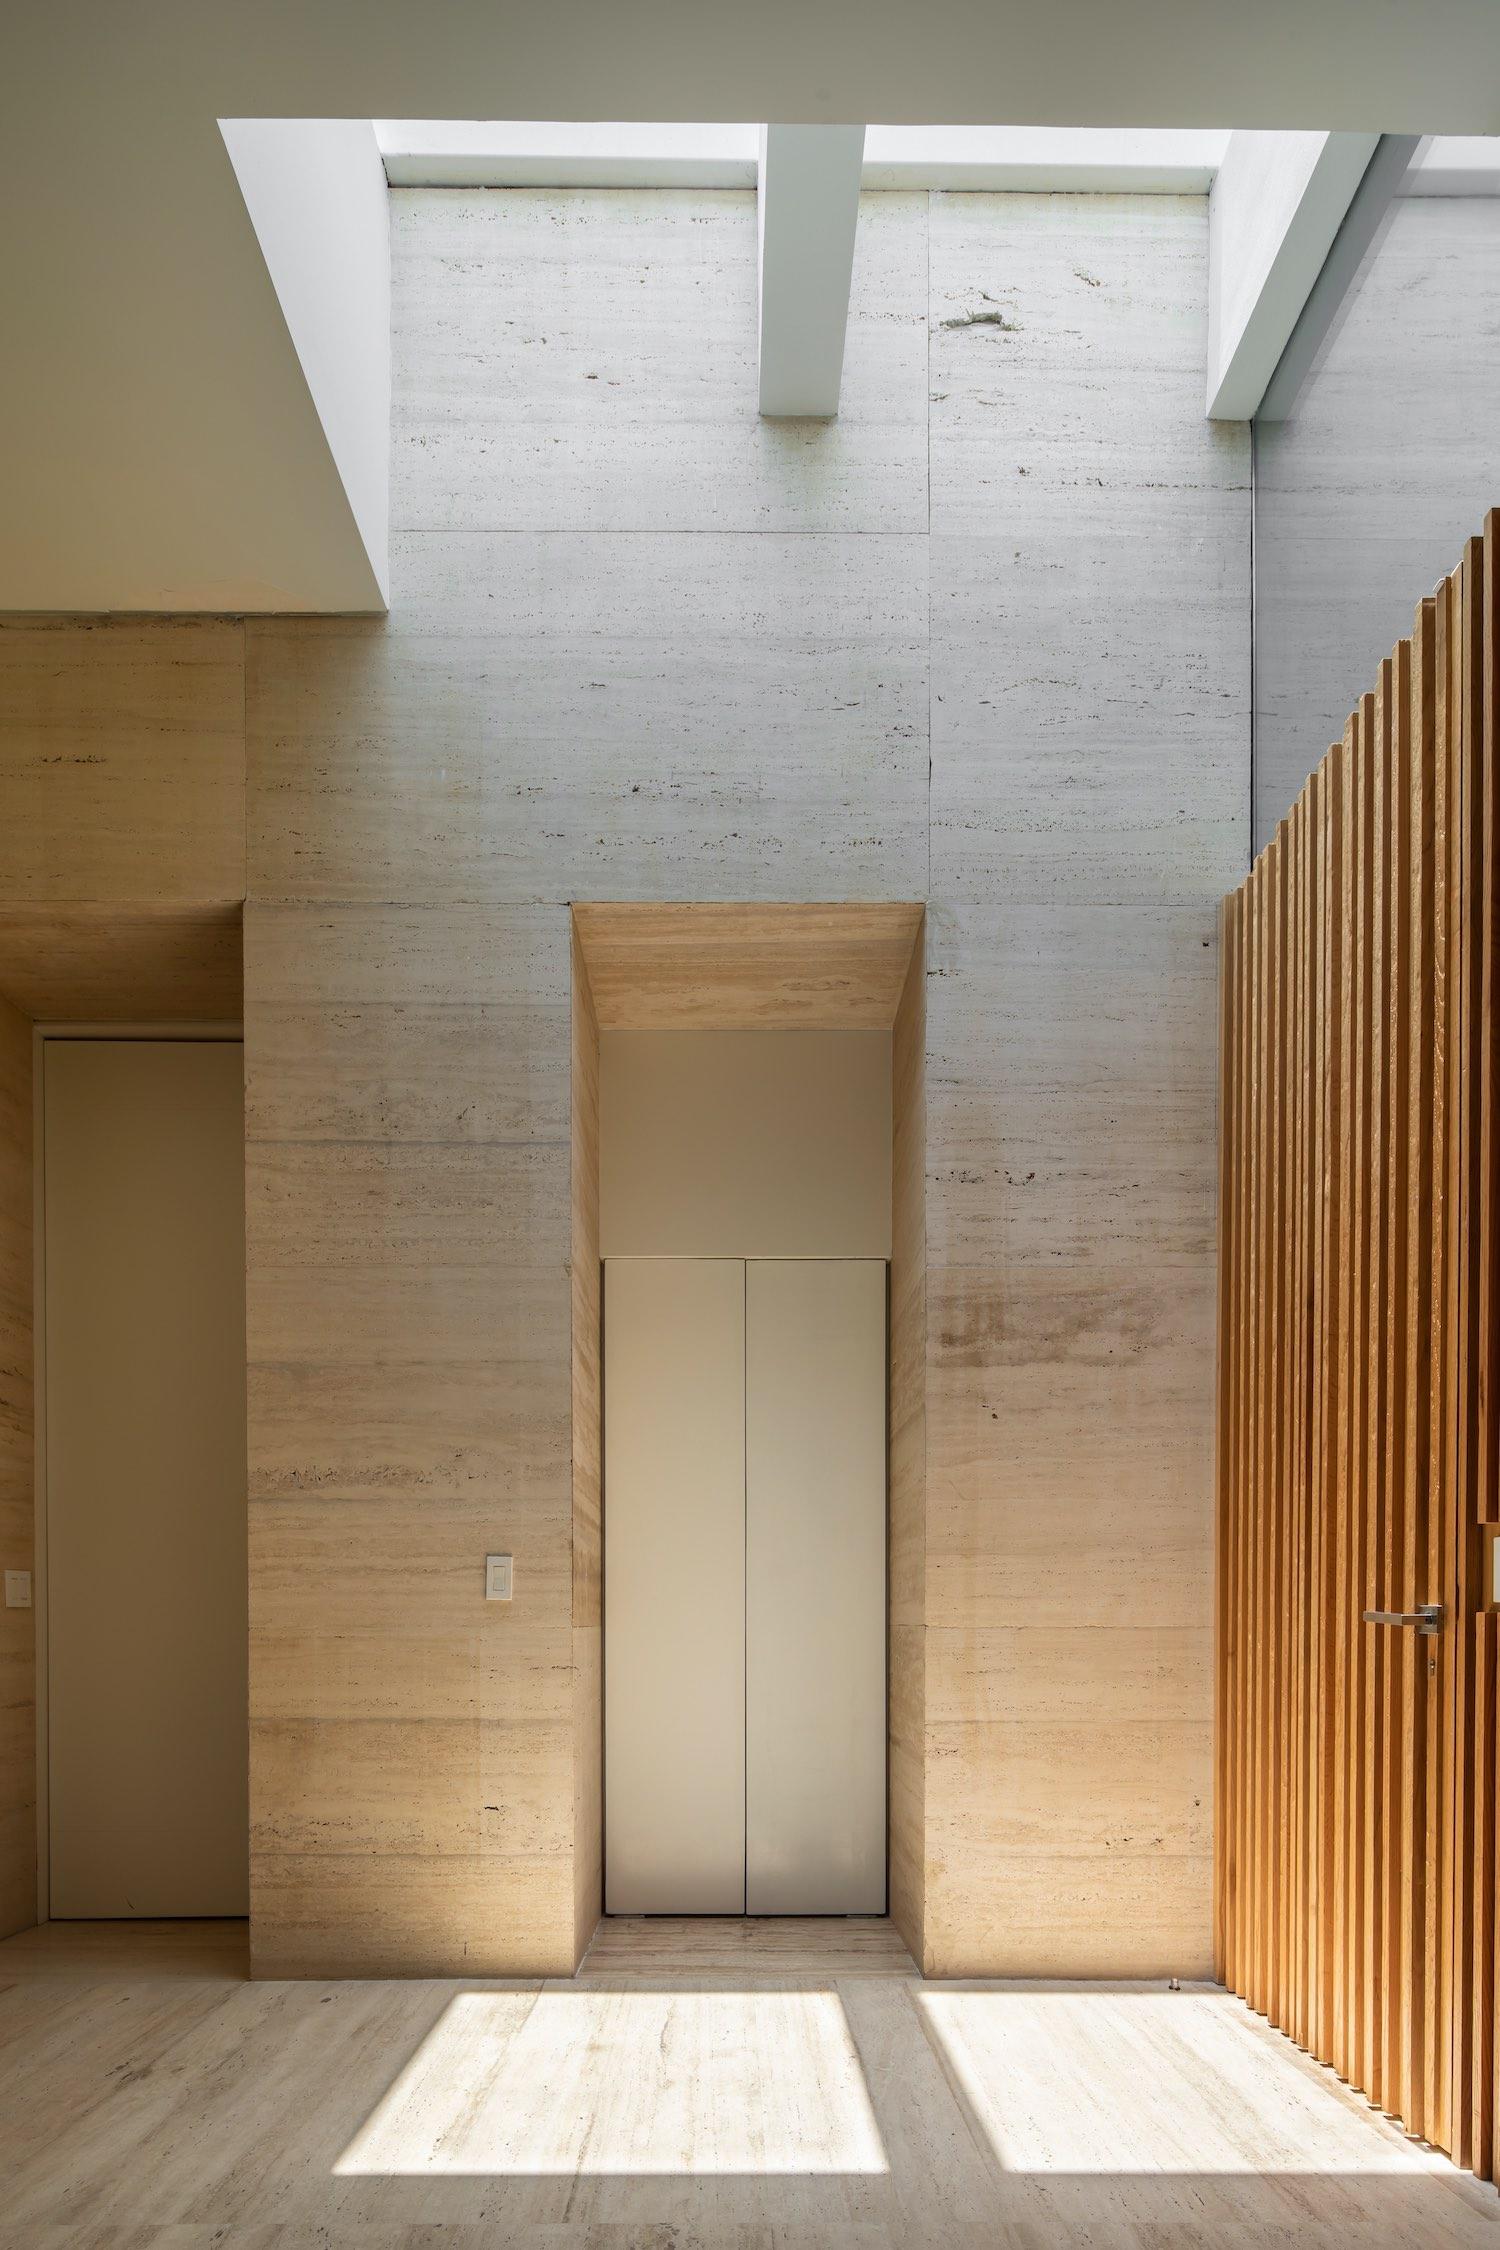 oak wood door and marble stone walls